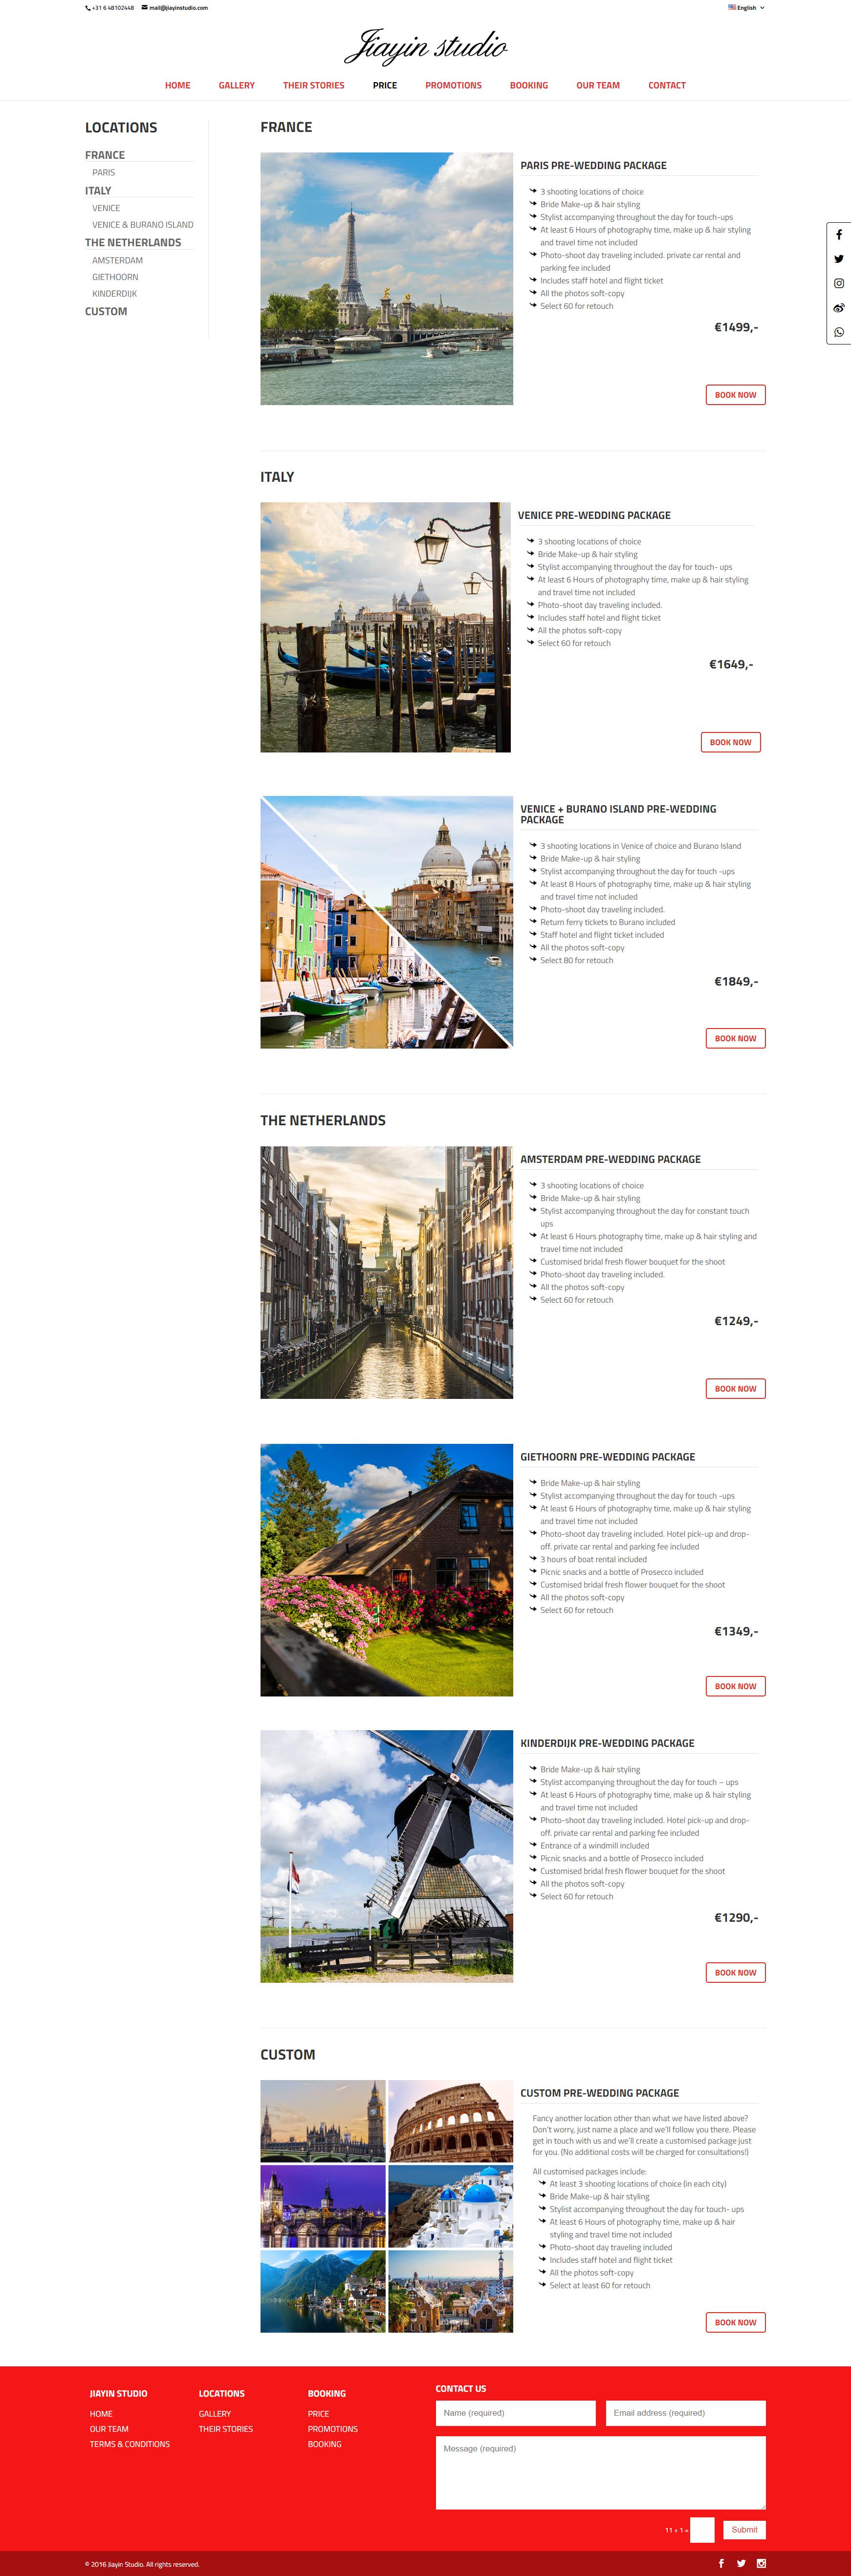 Jiayin Studio Price Page